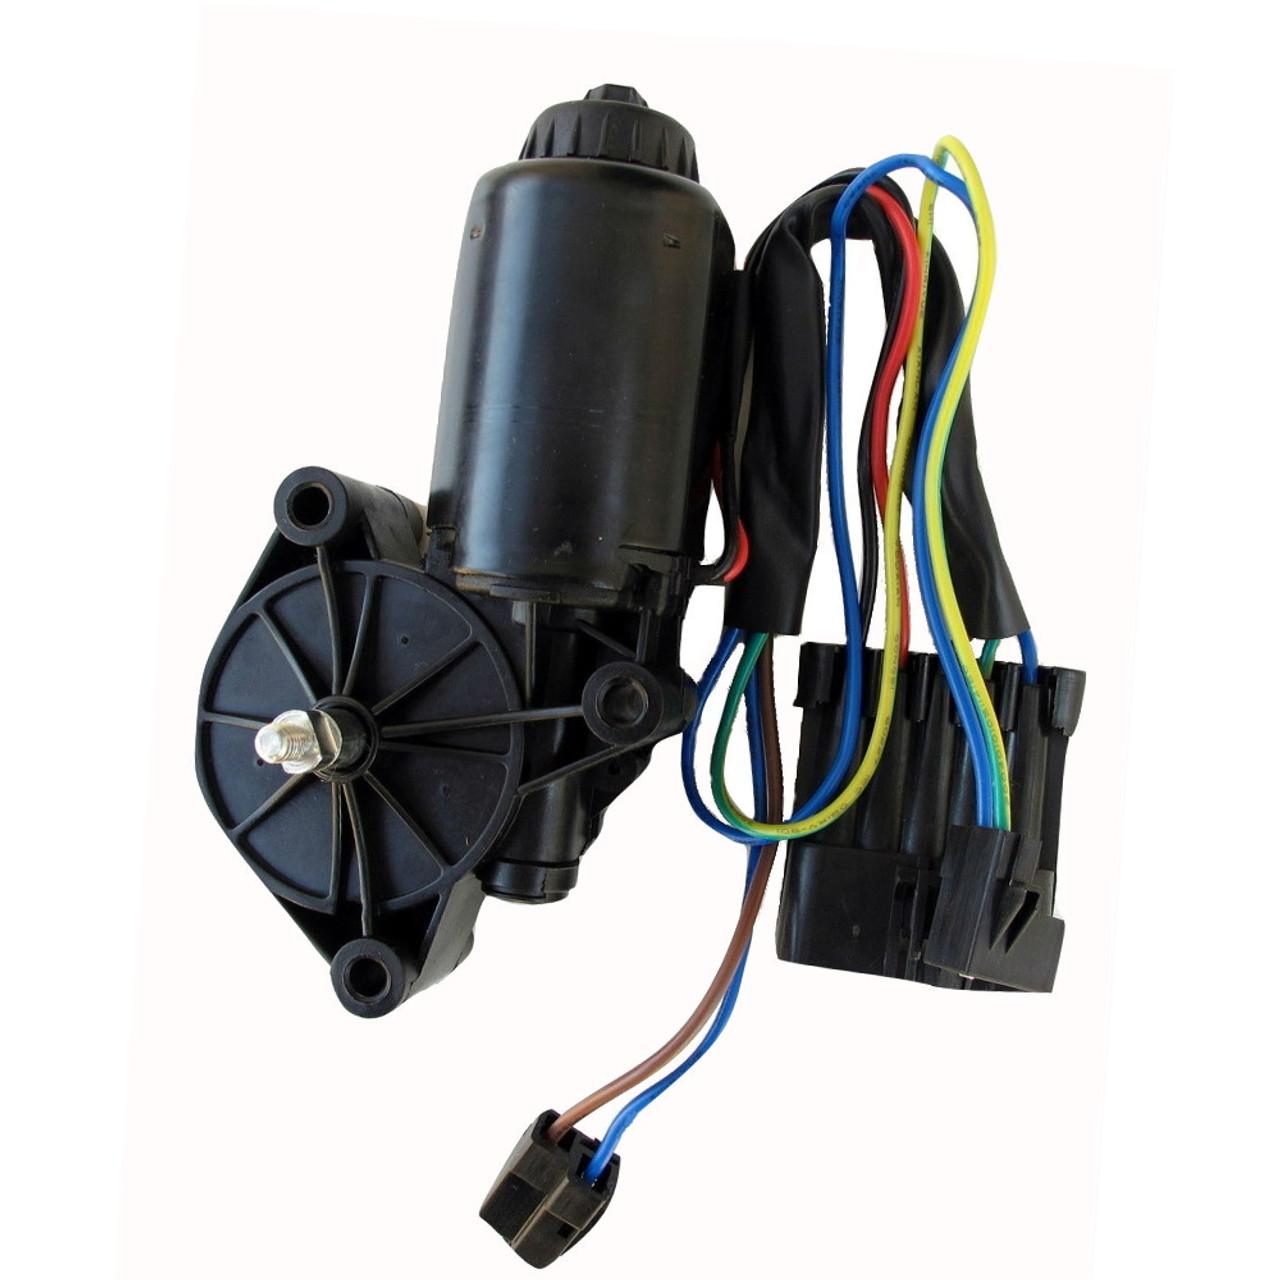 new 1998 2002 firebird headlight actuator motor wire harness rh westcoast autoparts com [ 1000 x 1000 Pixel ]